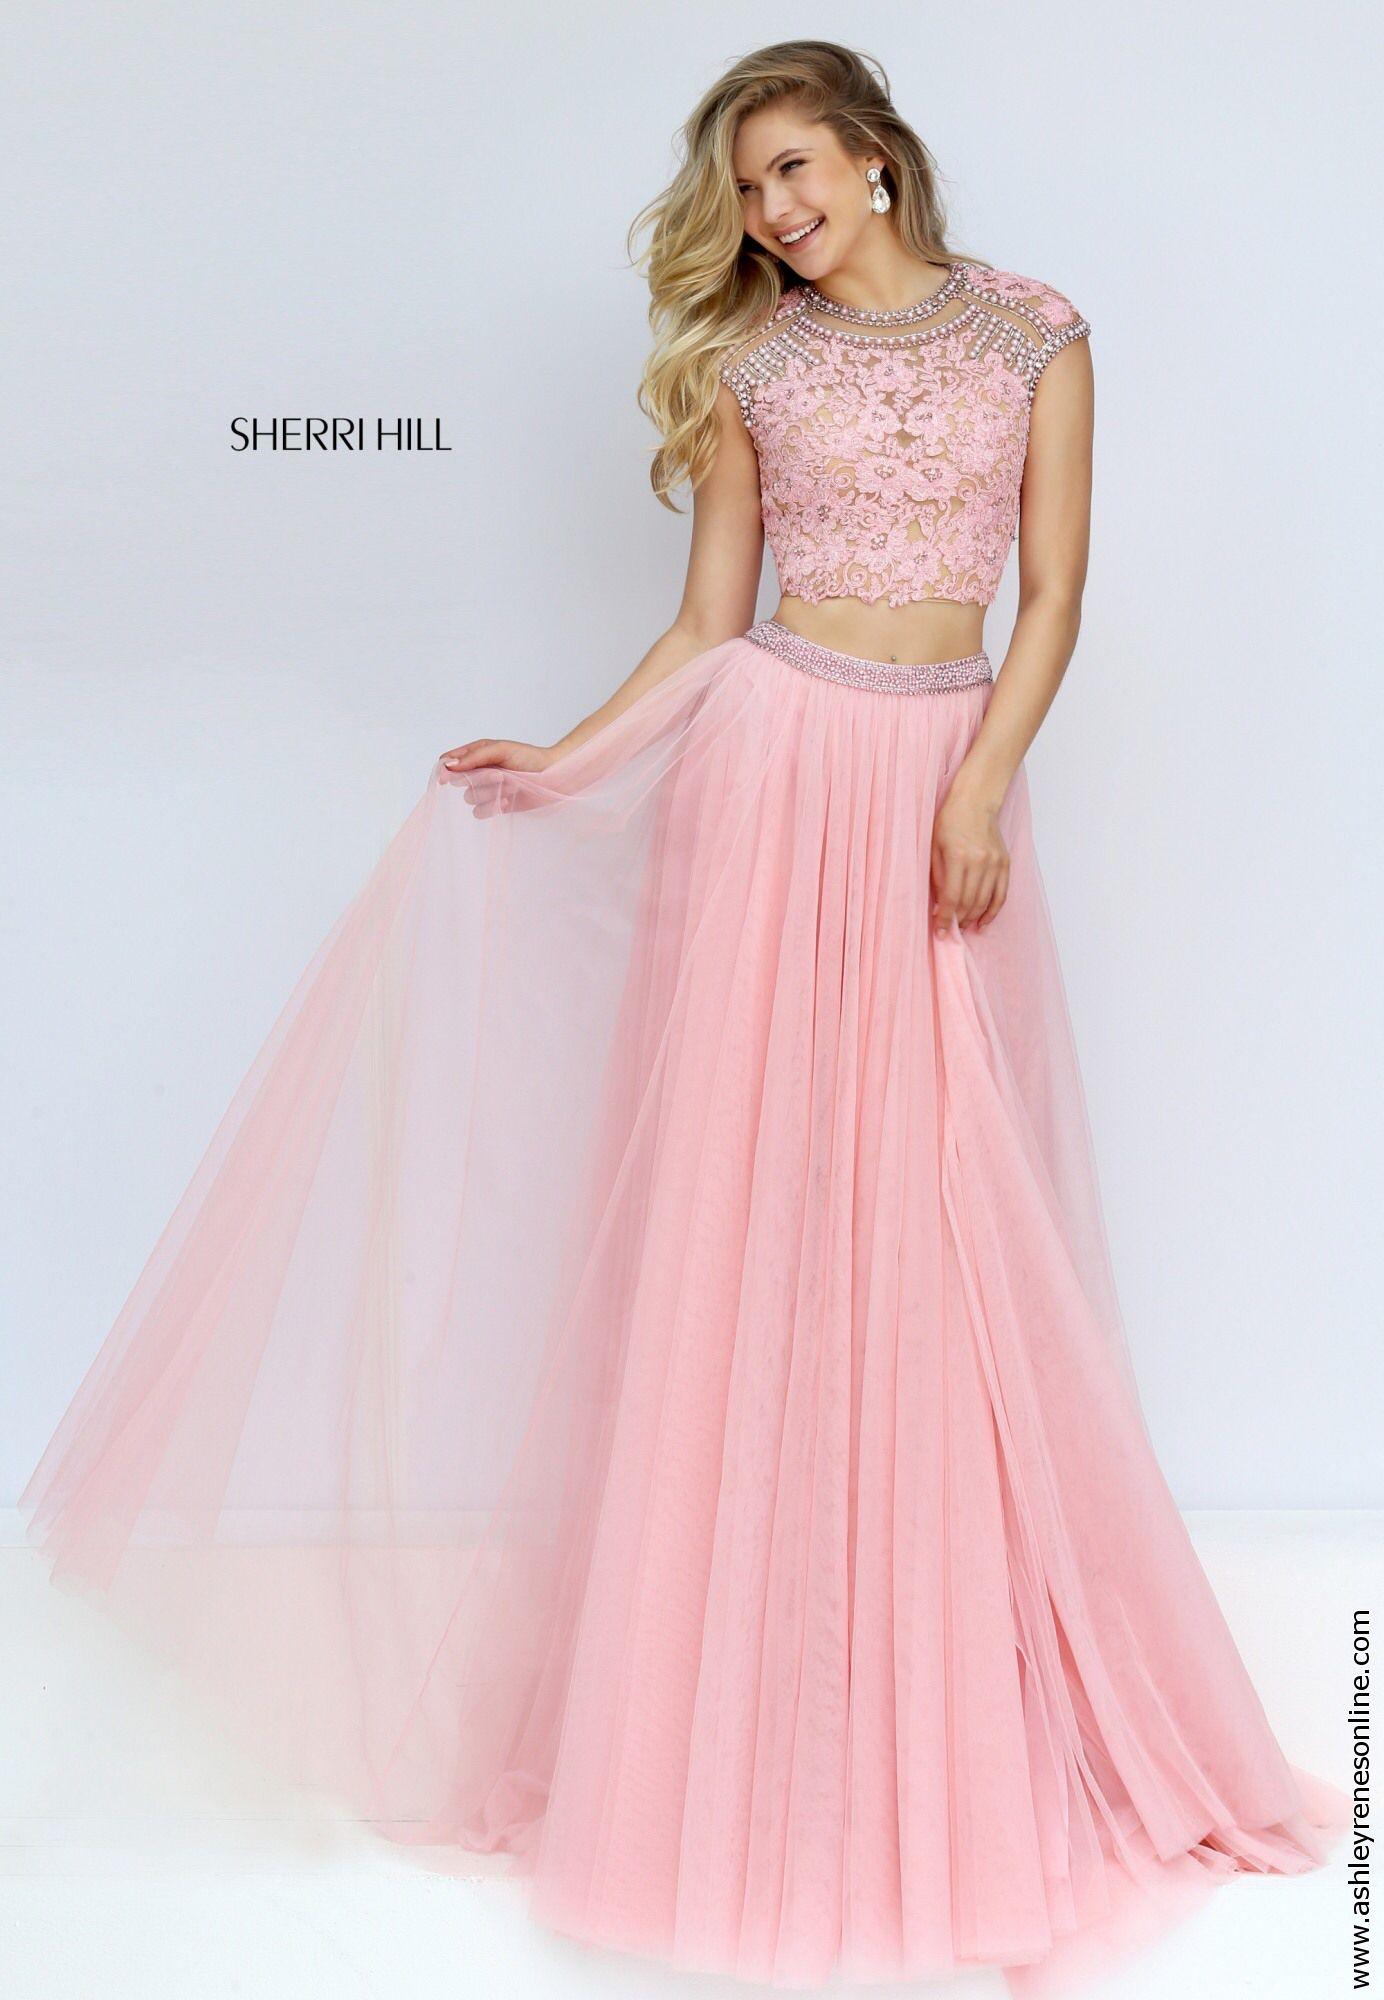 Sherri Hill at Ashley Rene\'s Elkhart, IN 574-522-7766 | vestidos de ...